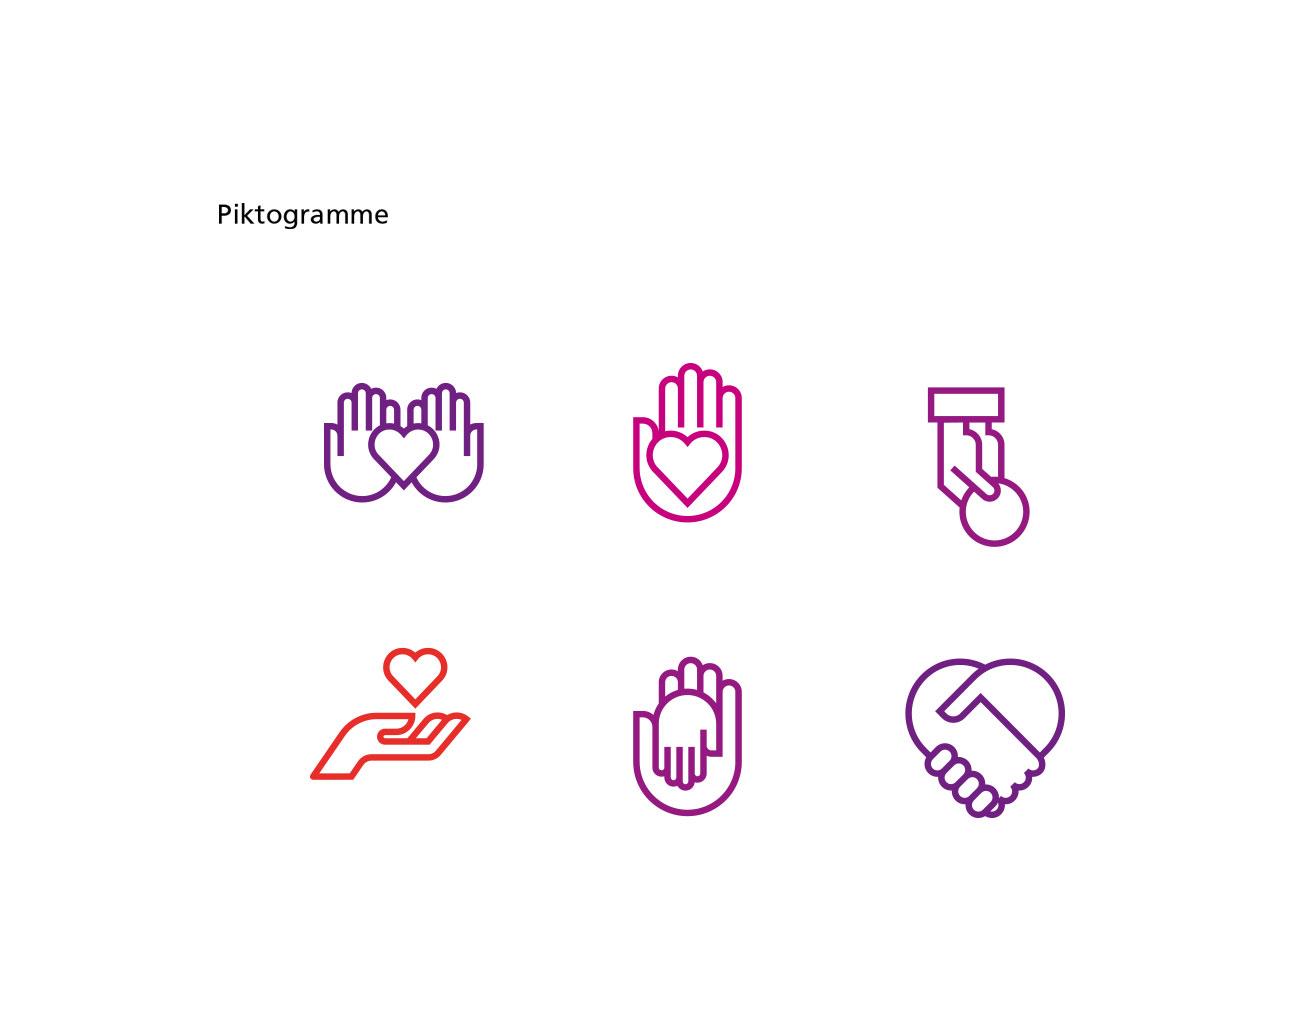 Petra Zimmerer, Büro für Gestaltung, Corporate Design, Sapv Südfranken, Piktogramme, Design by pz